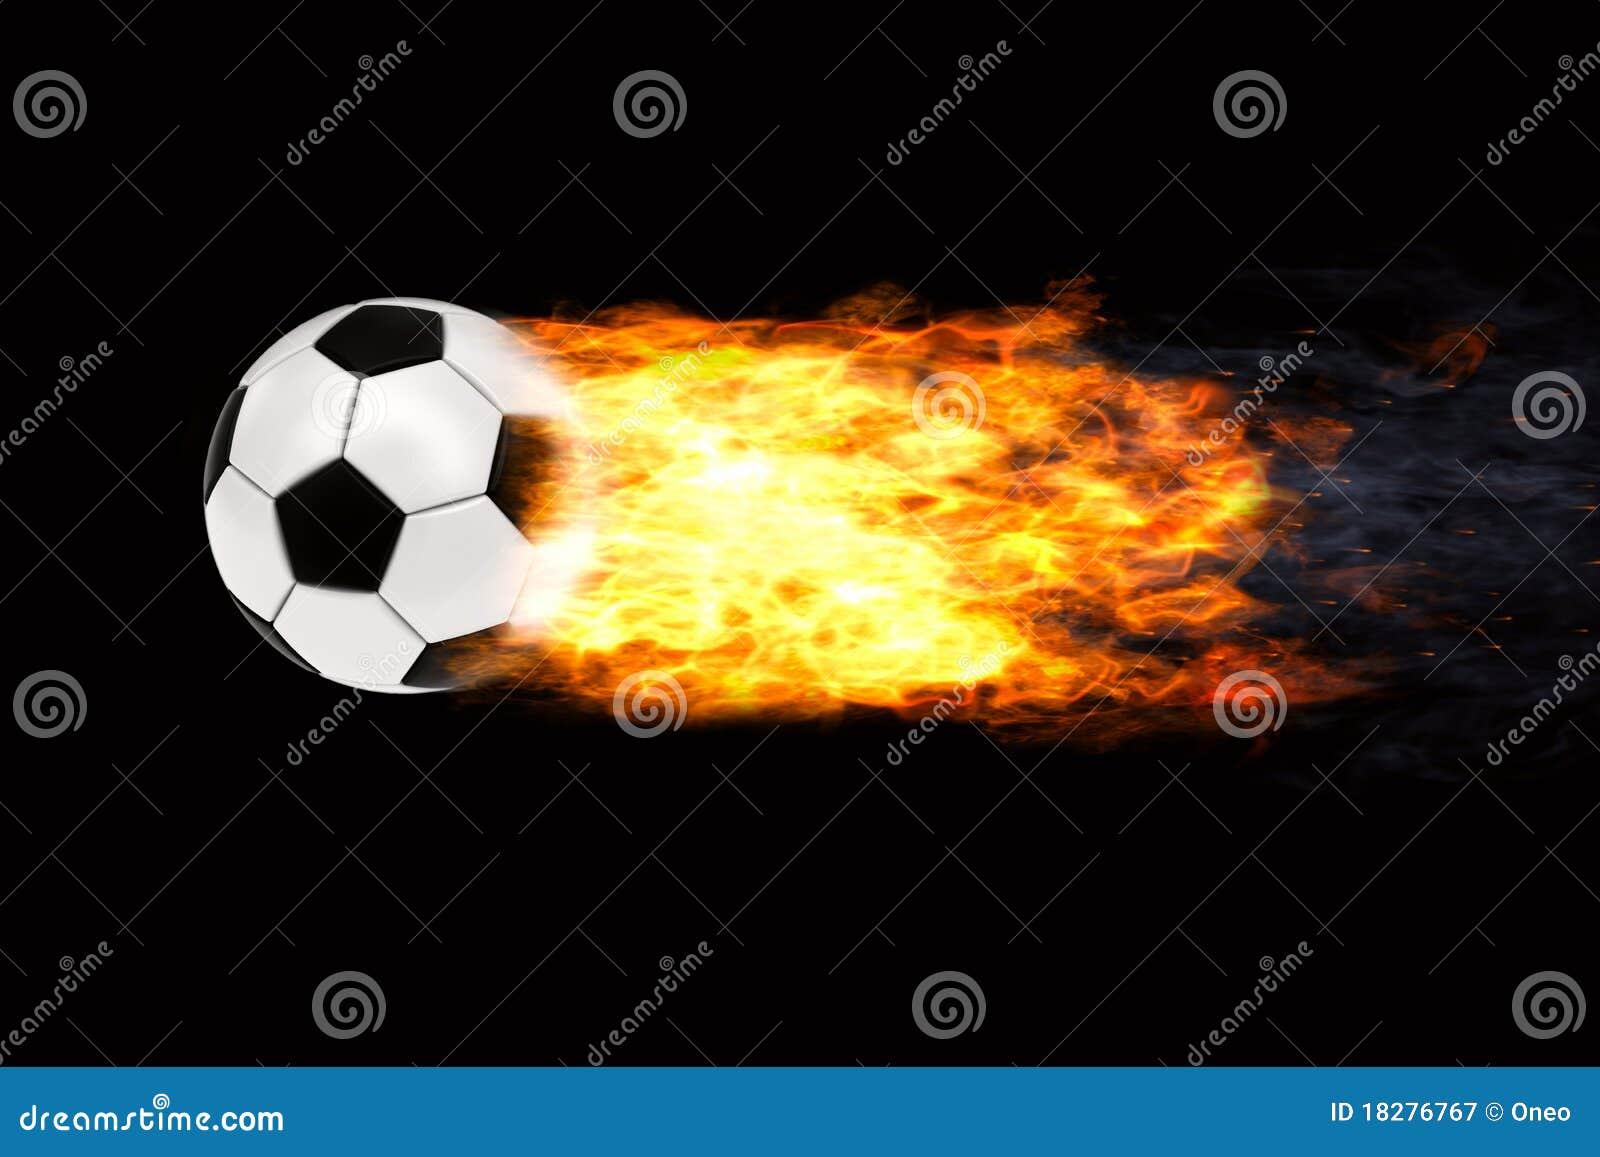 Fußballkugel in den Flammen